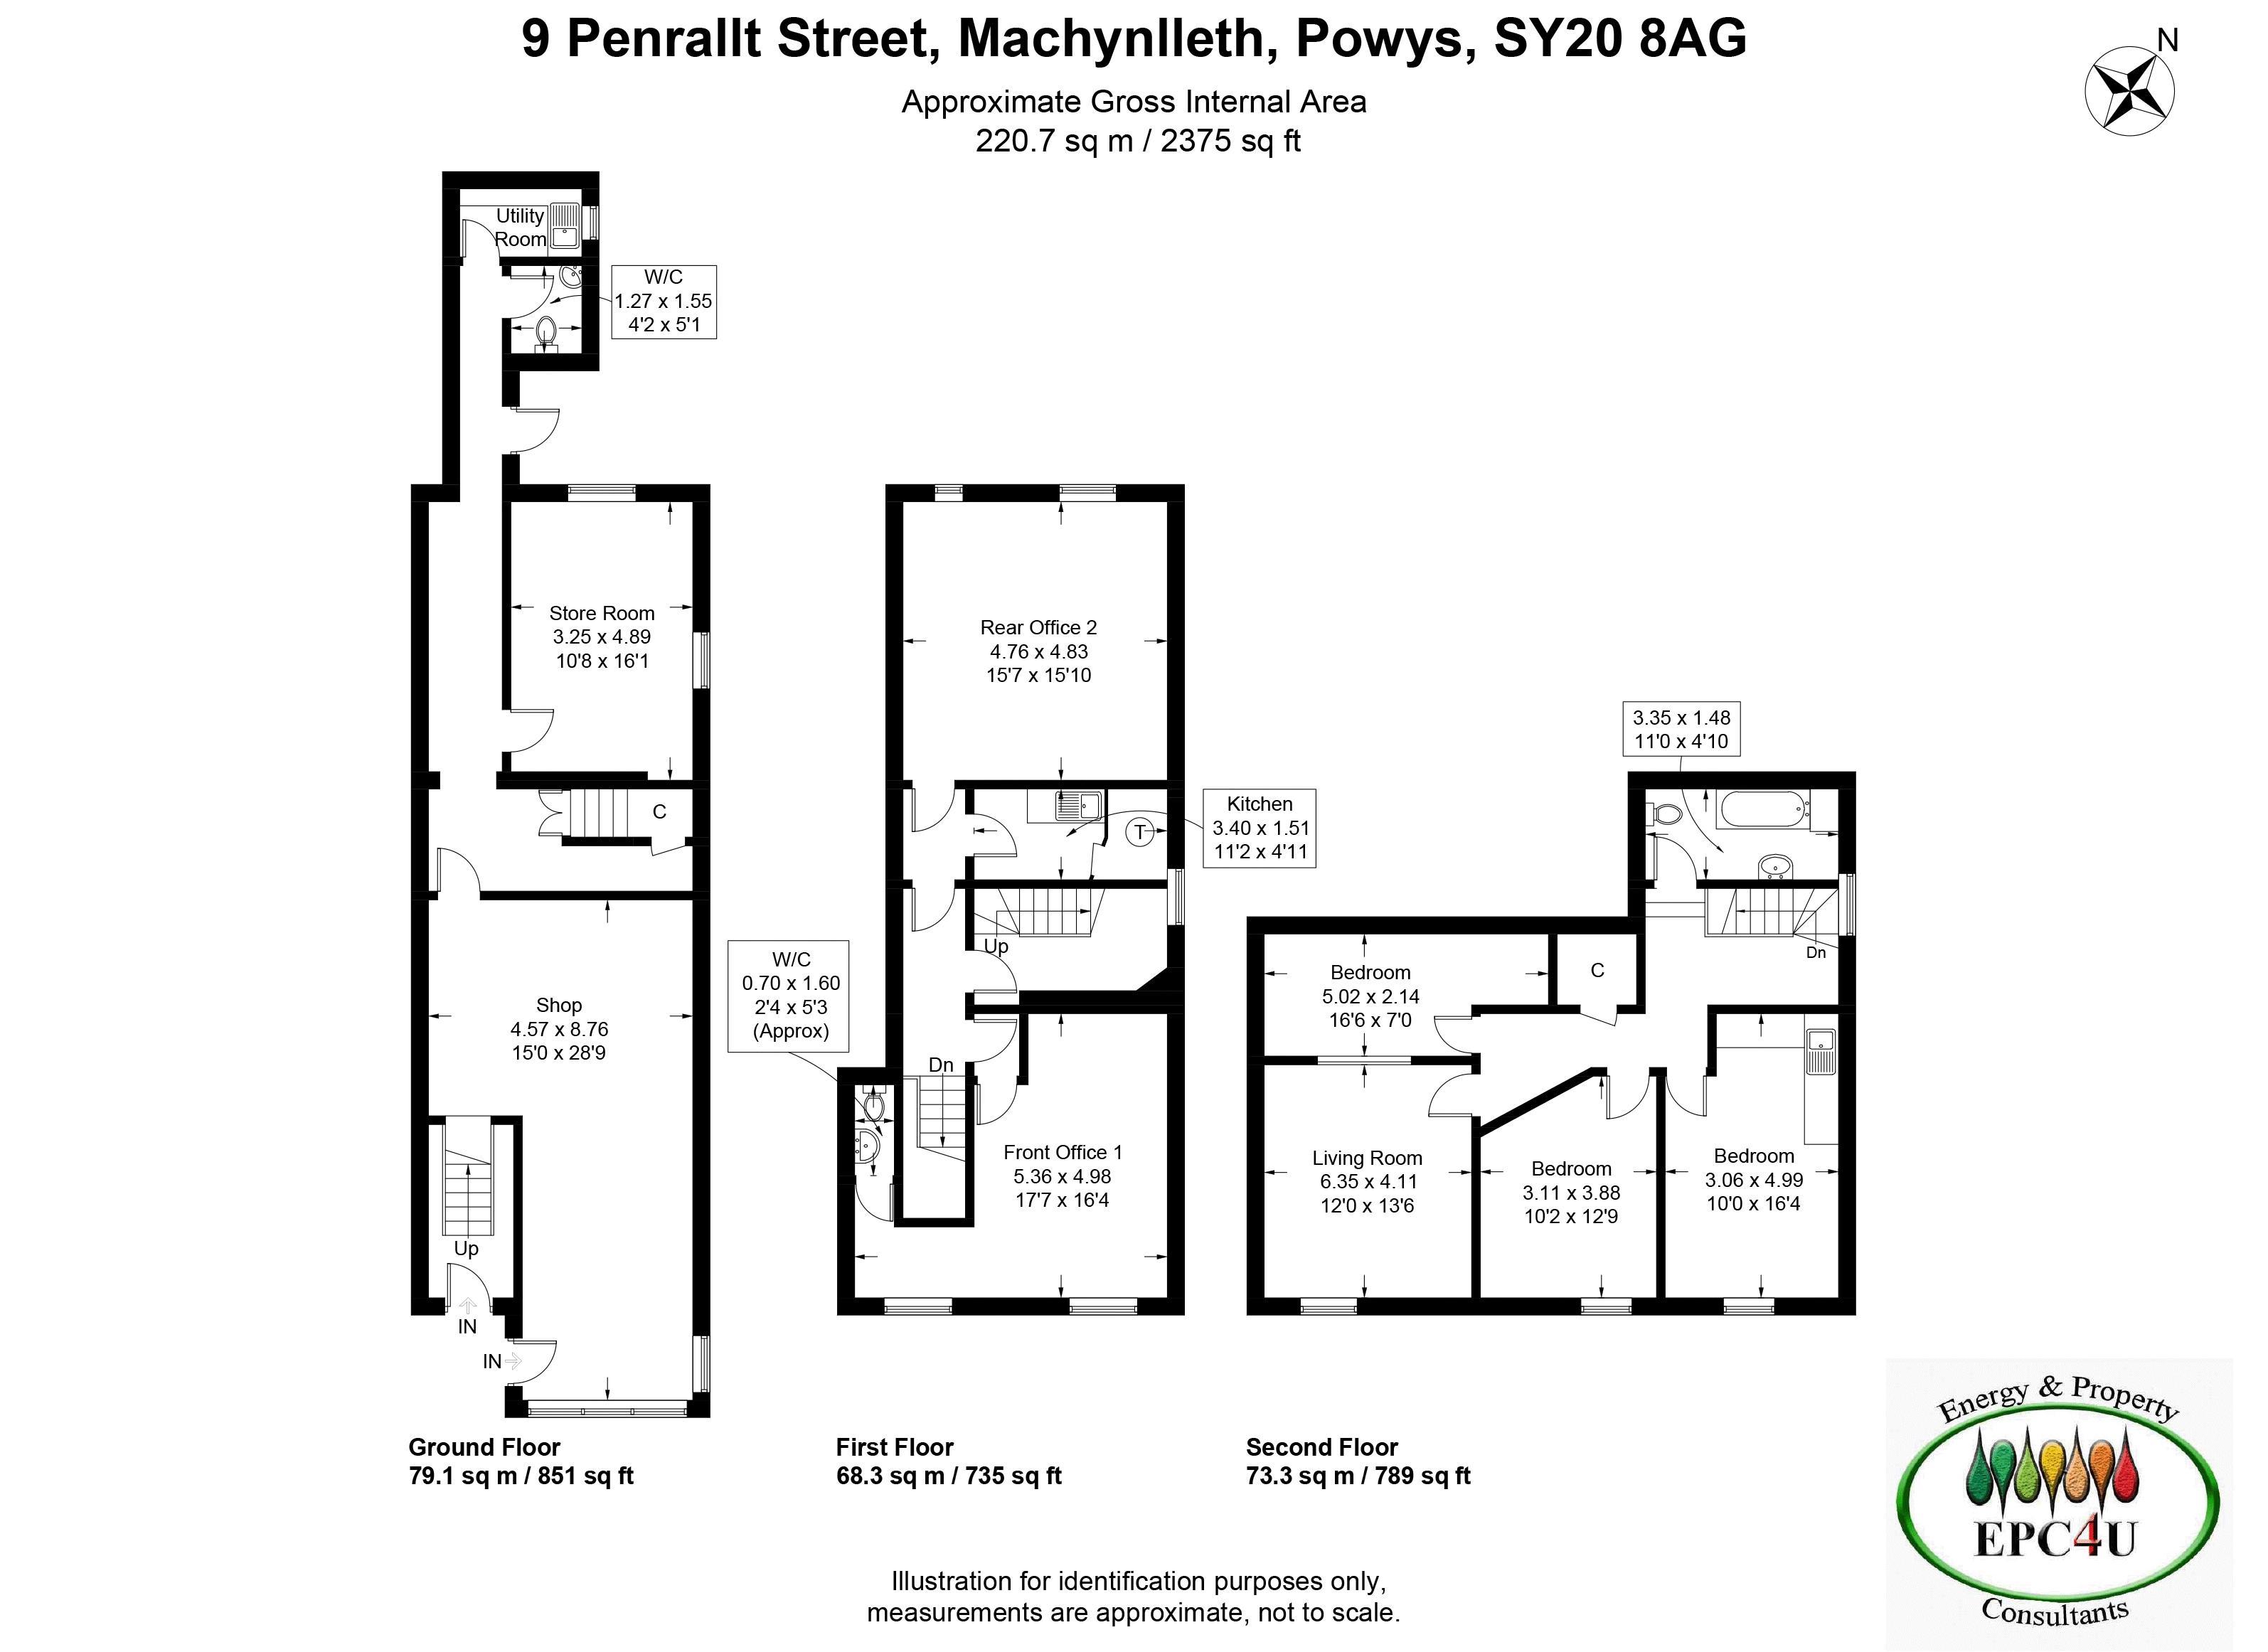 Penrallt Street